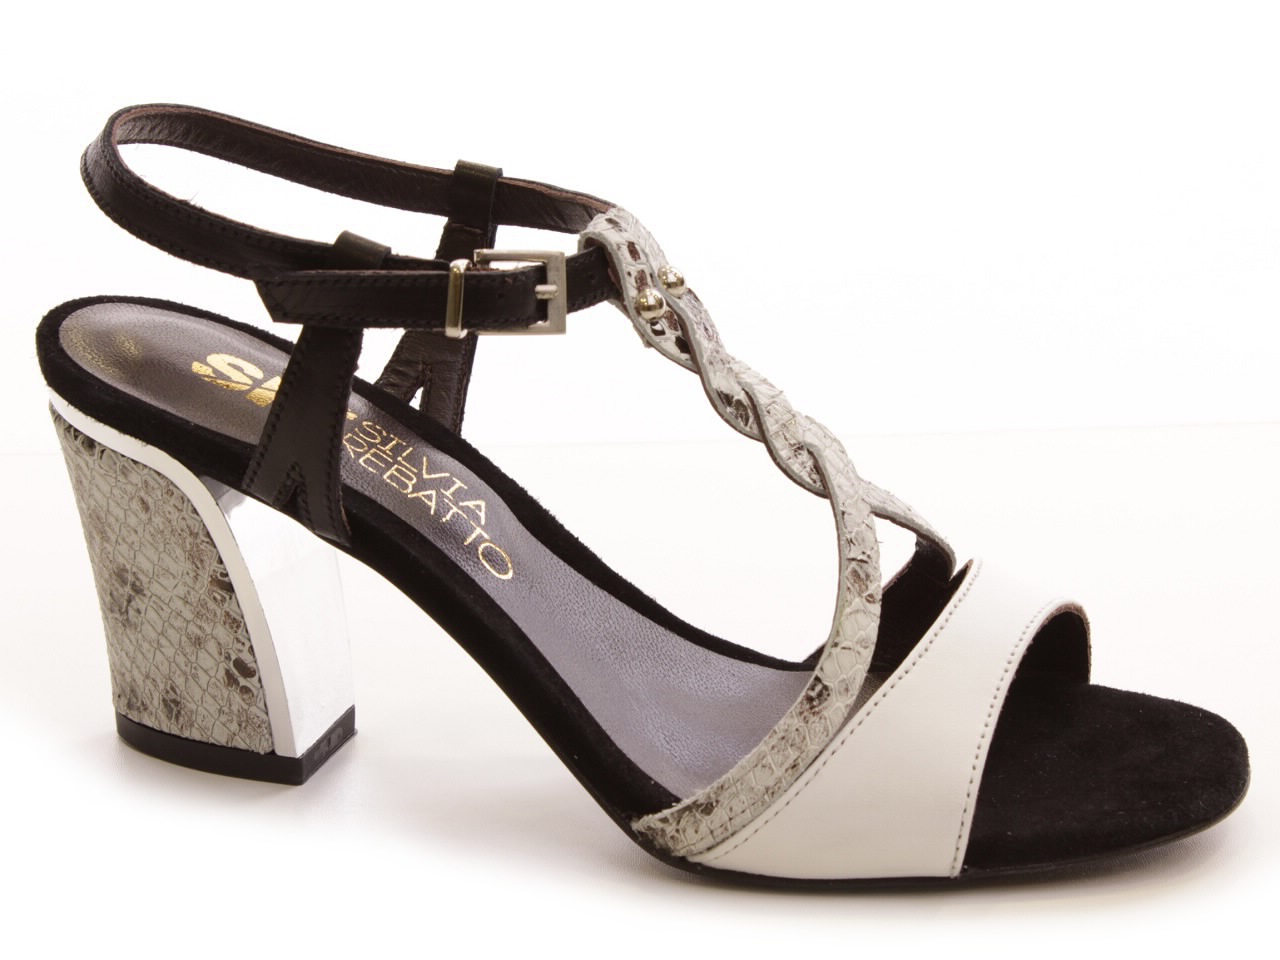 Sandales à talons Silvia Rebatto - 019 S9266